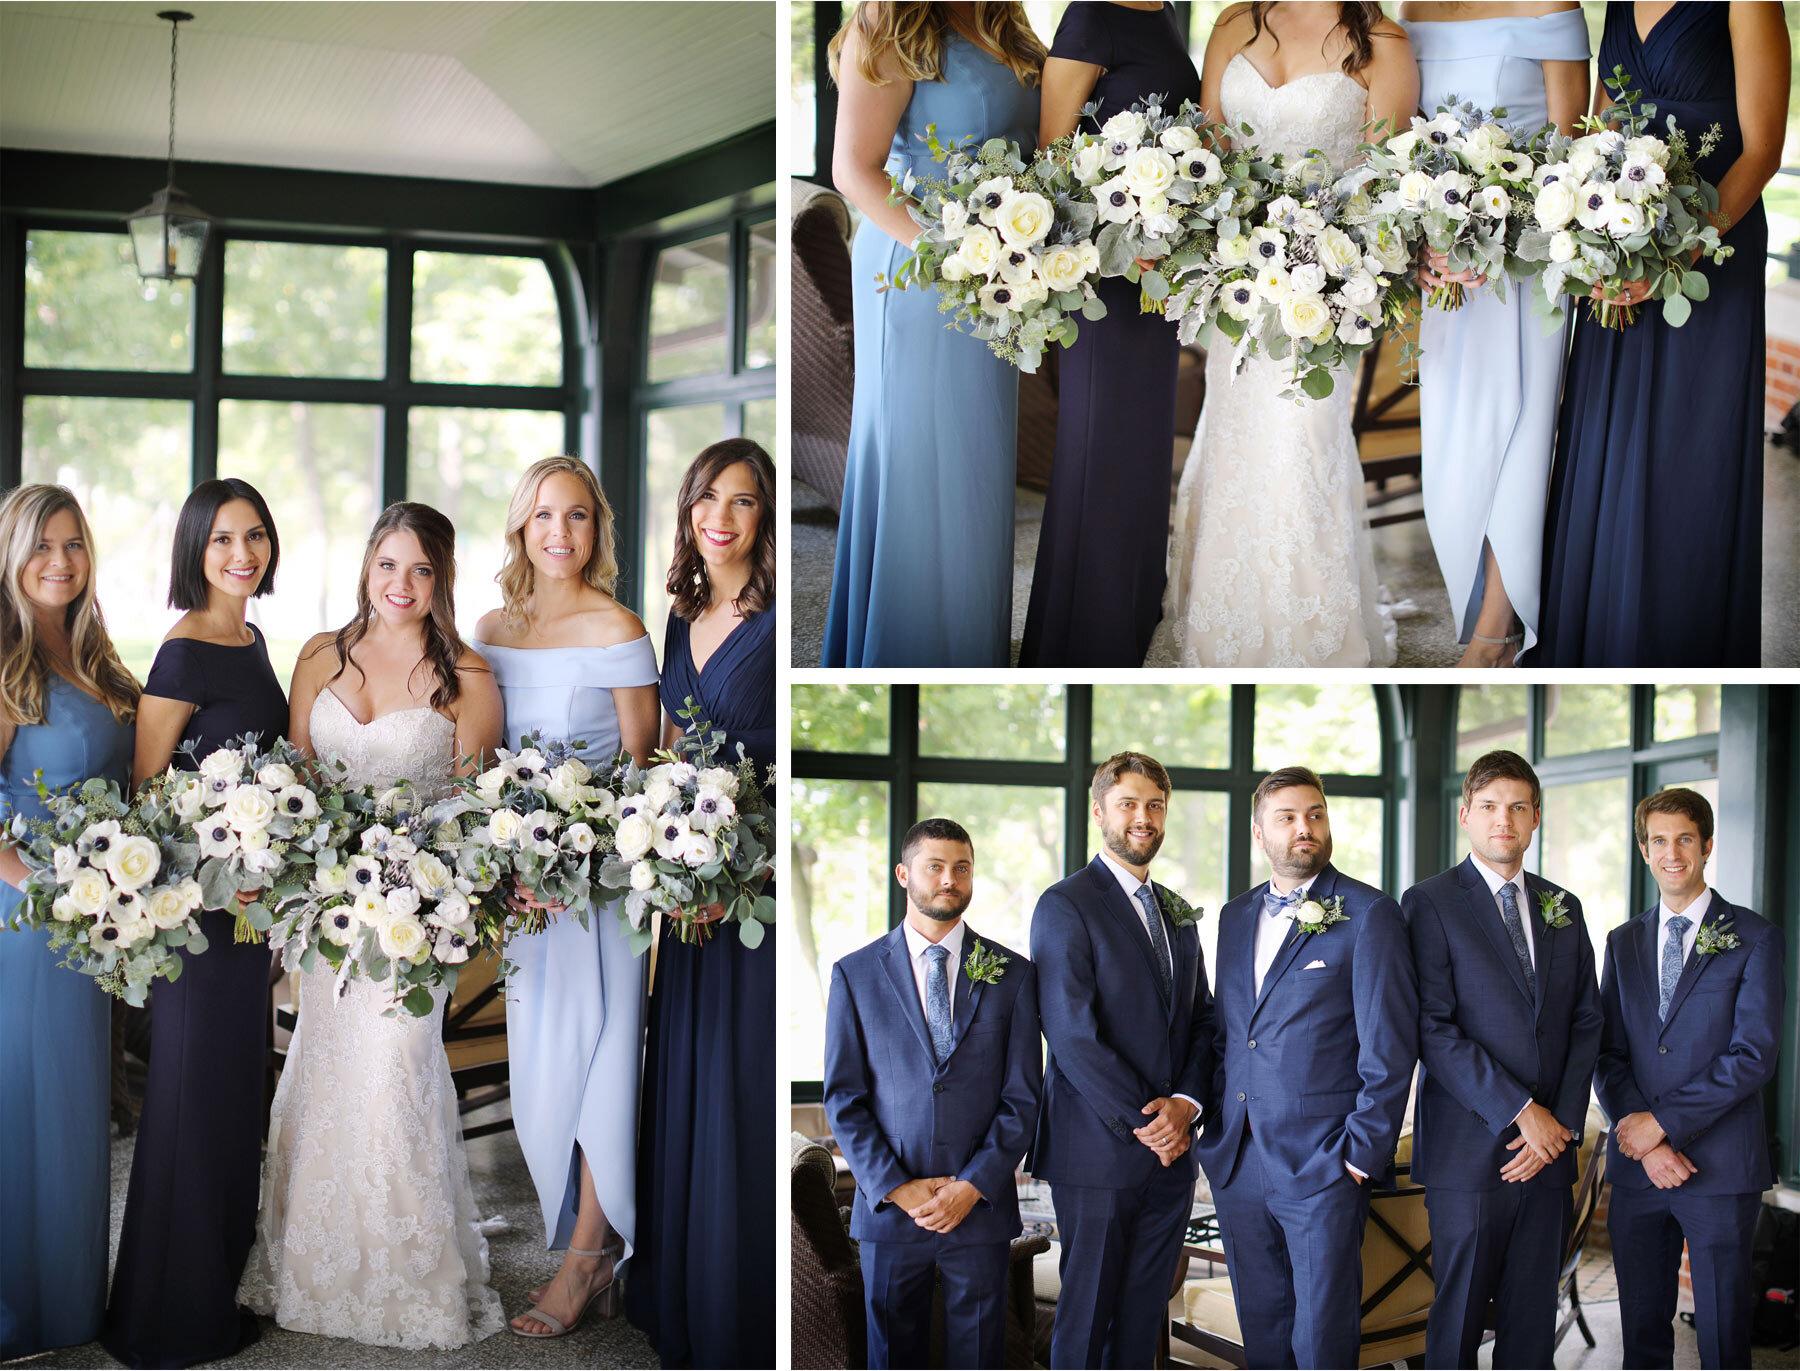 09-Vick-Photography-Wedding-Minnetonka-Minnesota-Lafayette-Club-Bridesmaids-Flowers-Groomsmen-Katie-and-David.jpg